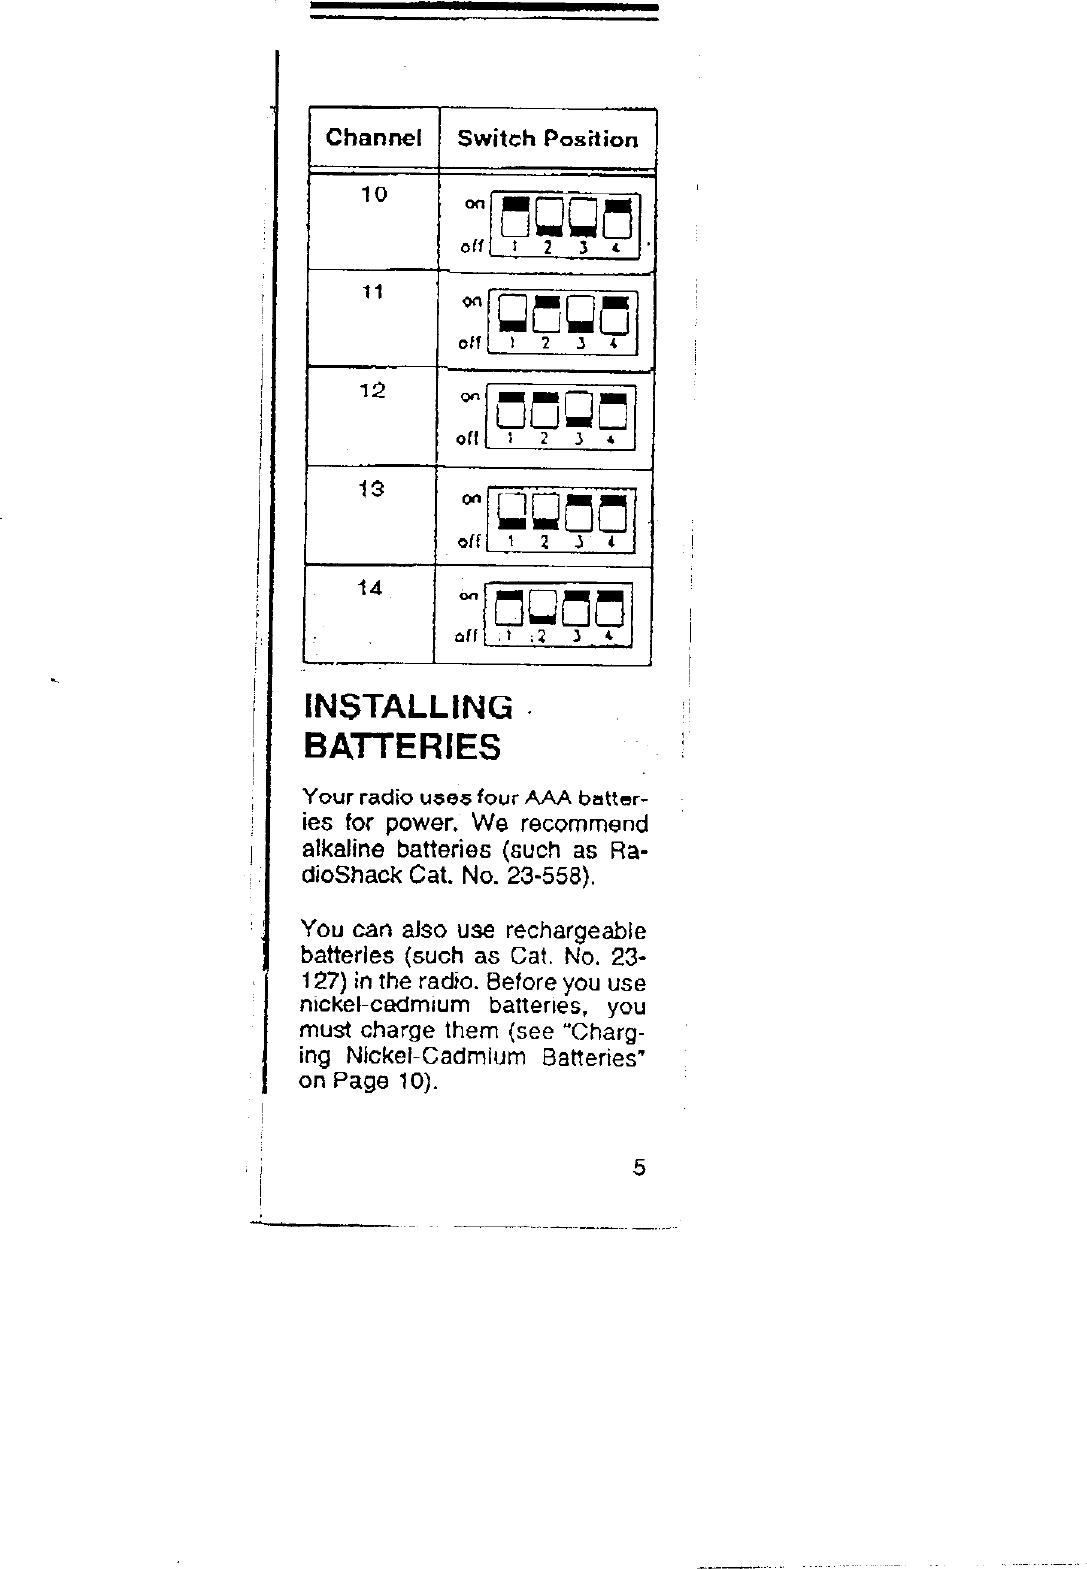 Radio Shack 21-1804 User Manual 52043